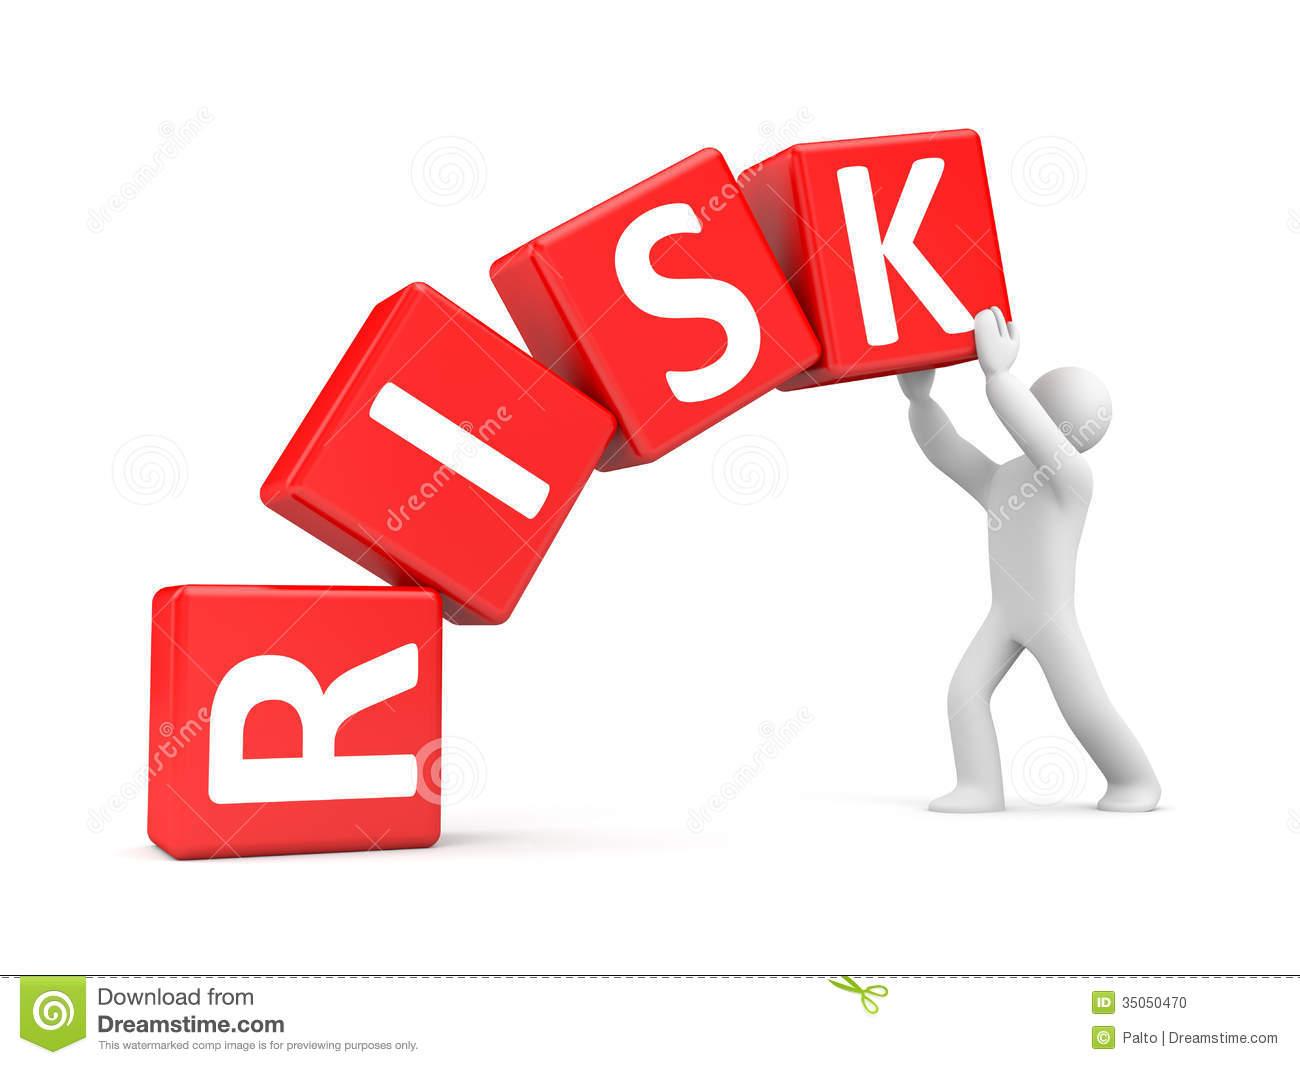 91+ Risk Clipart.